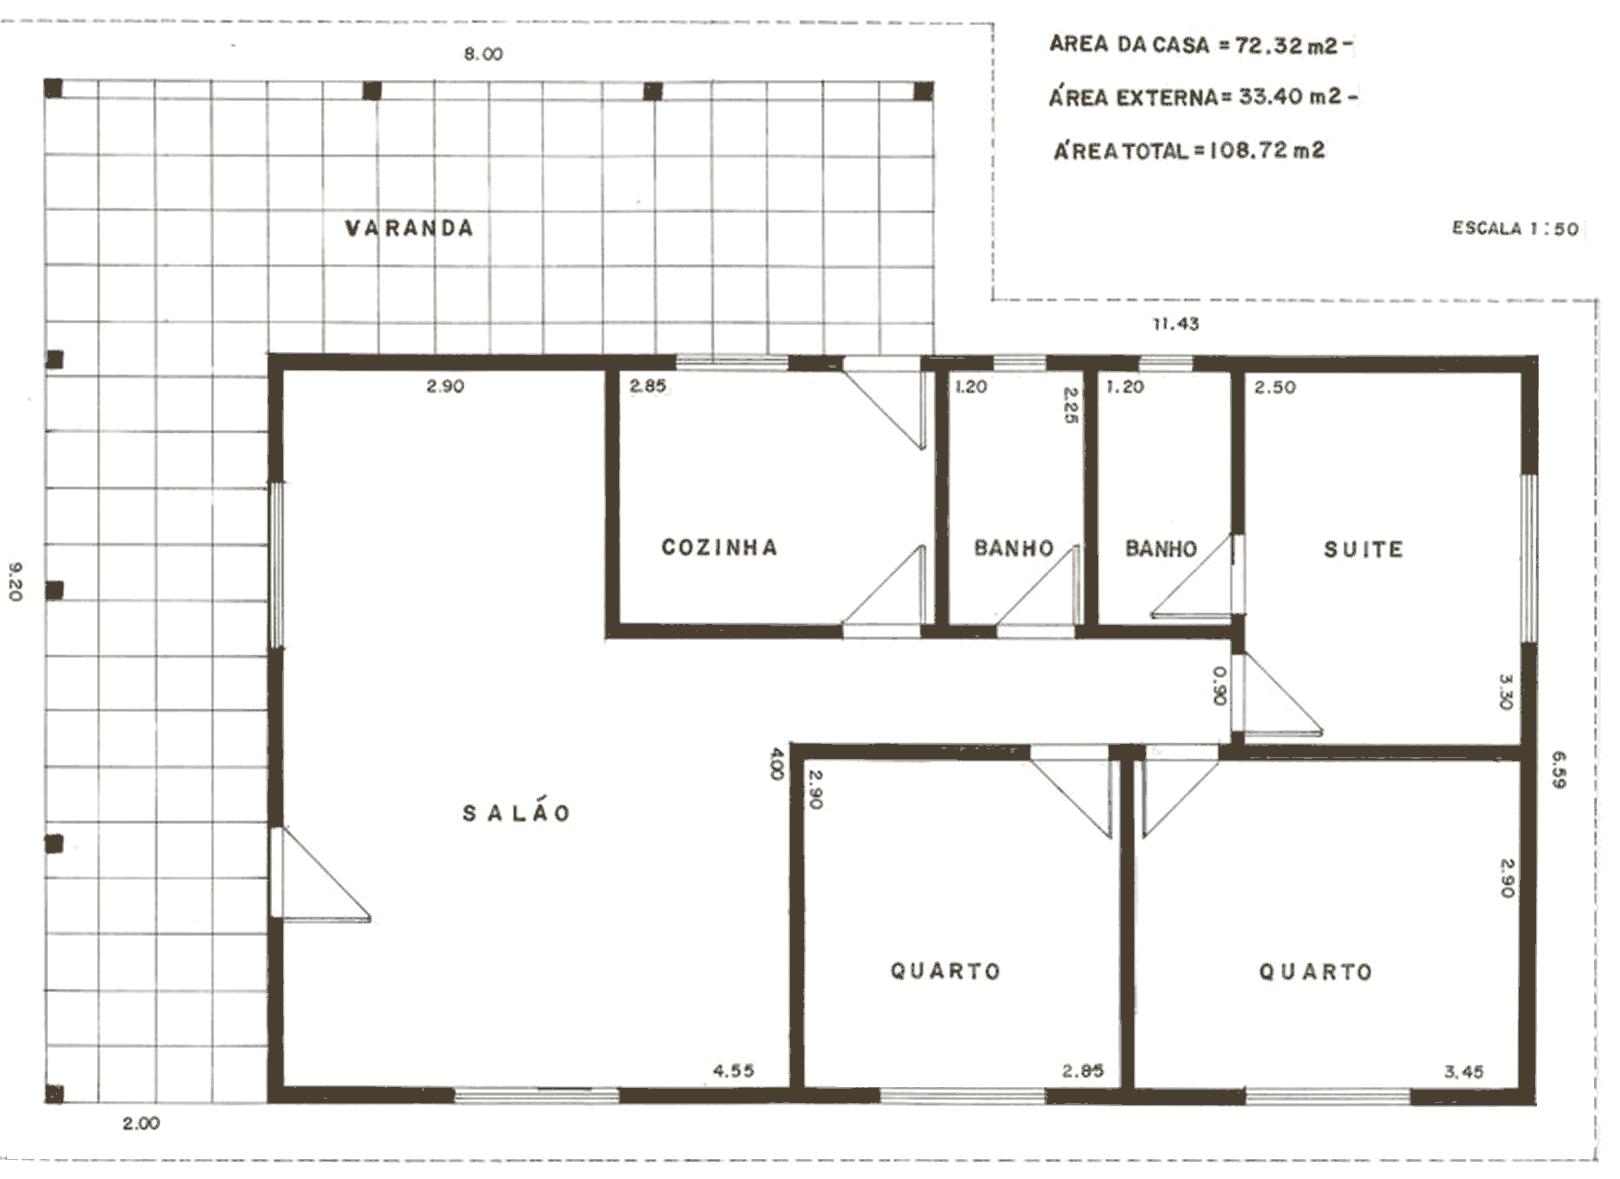 Plantas de casas de praia 41 modelos e projetos - Shop on line casa ...